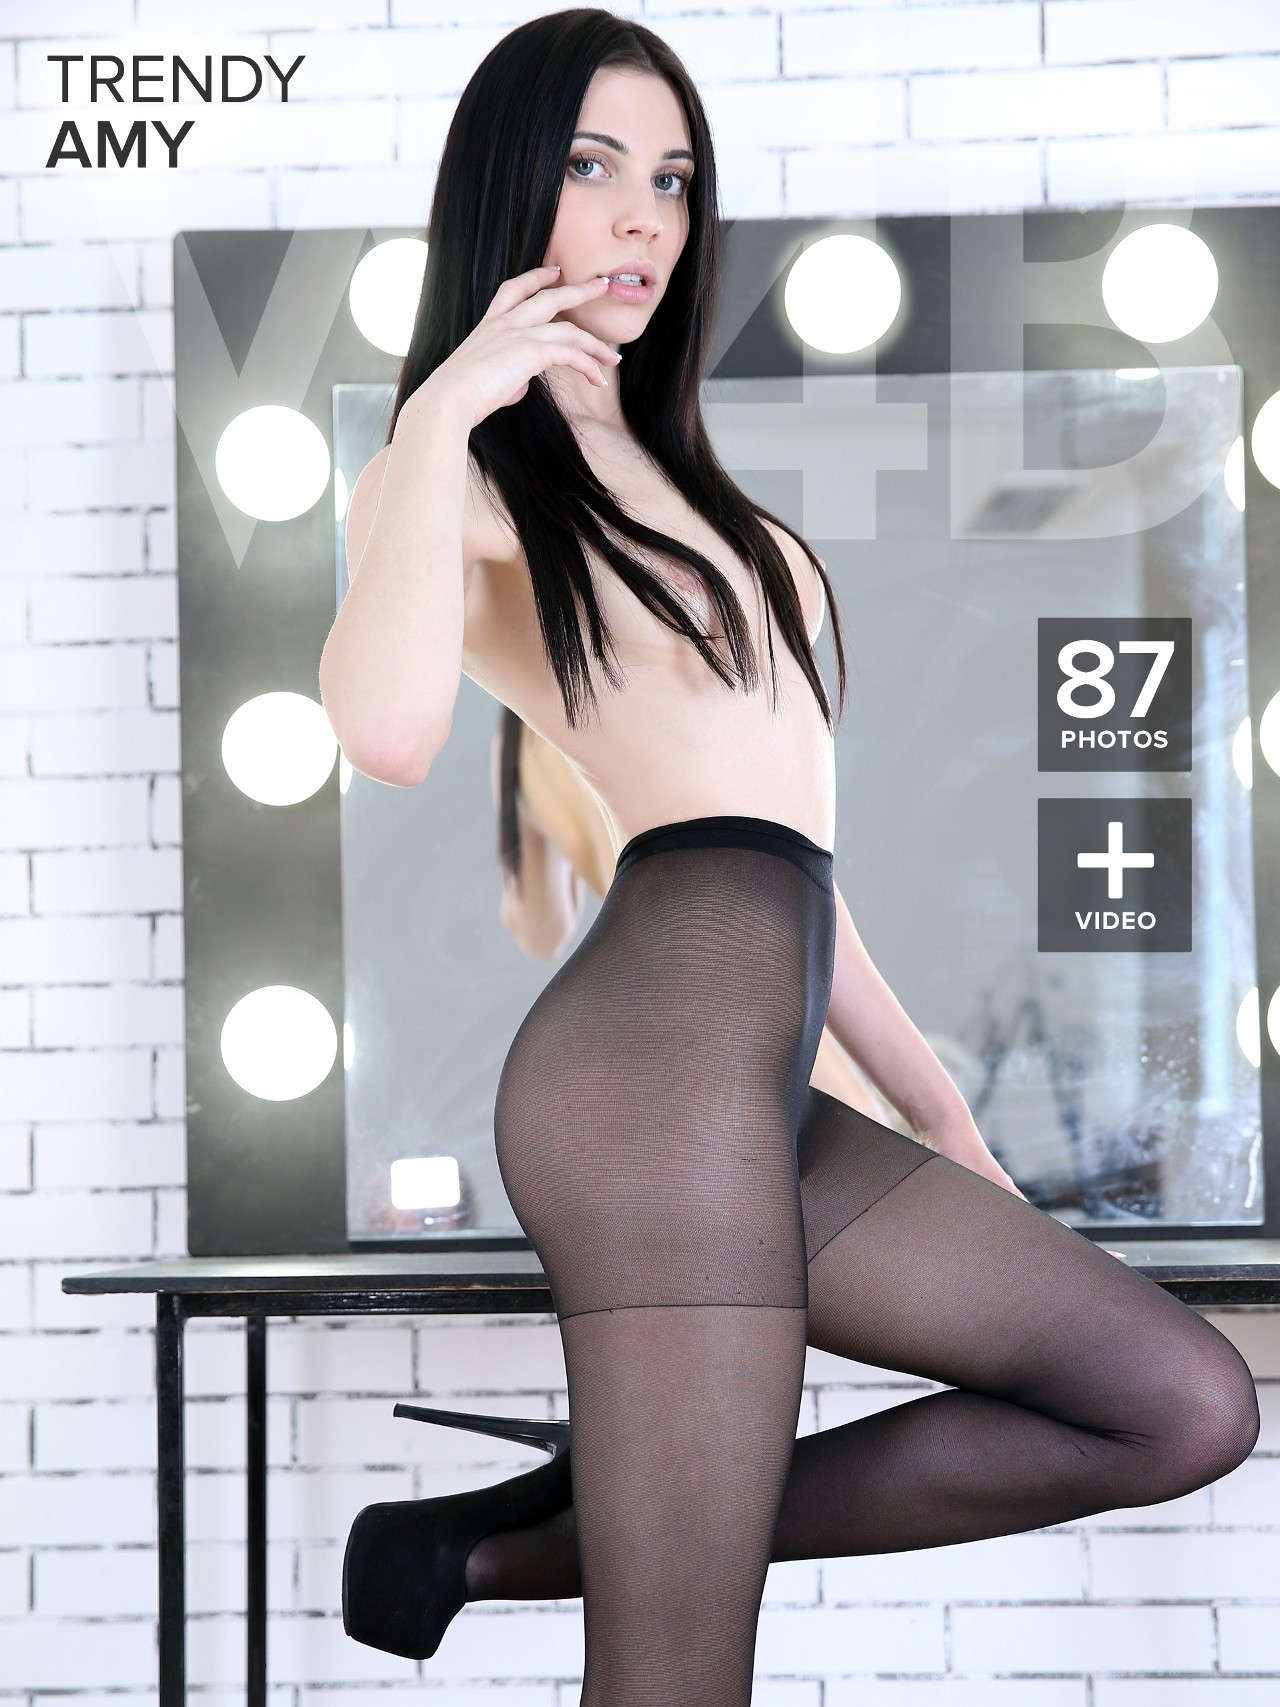 Amy Light: Trendy